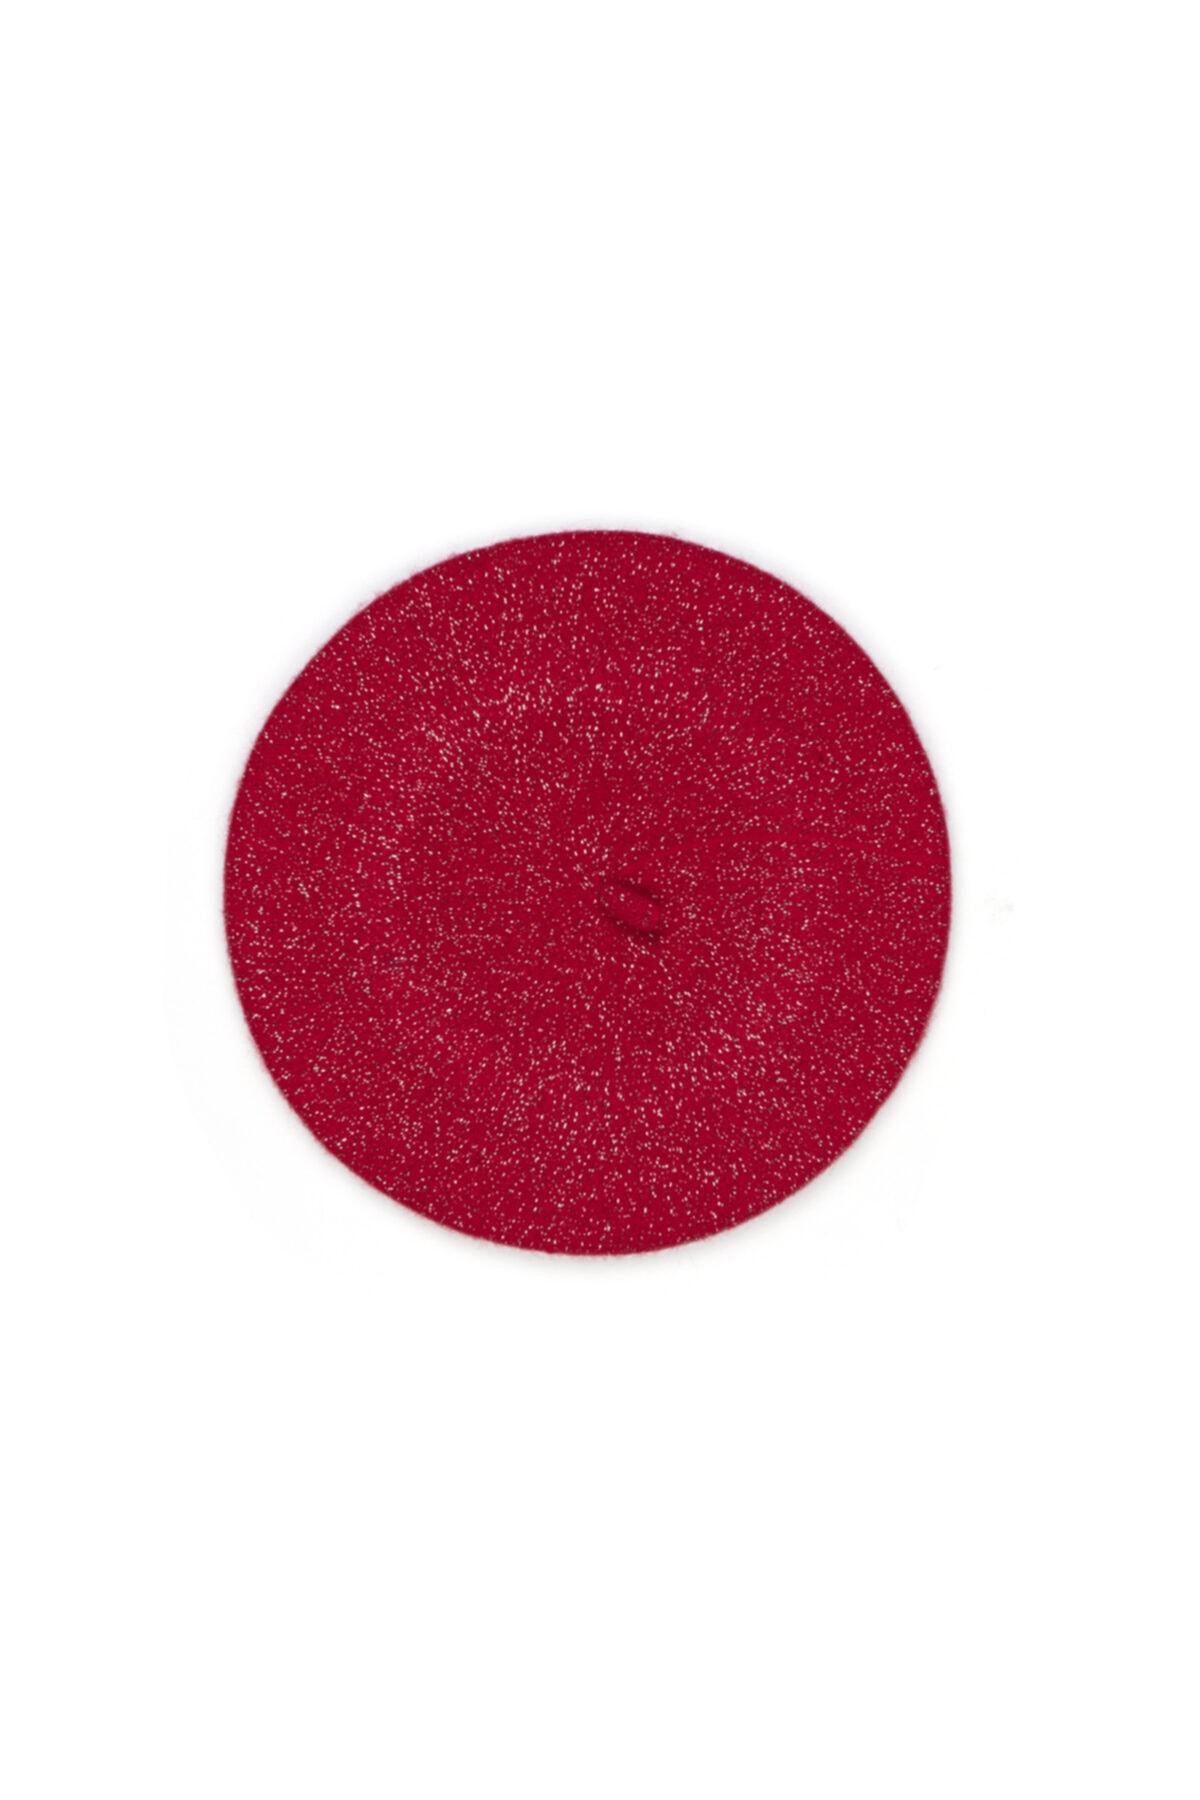 Mavi Simli Kırmızı Ressam Şapka 1